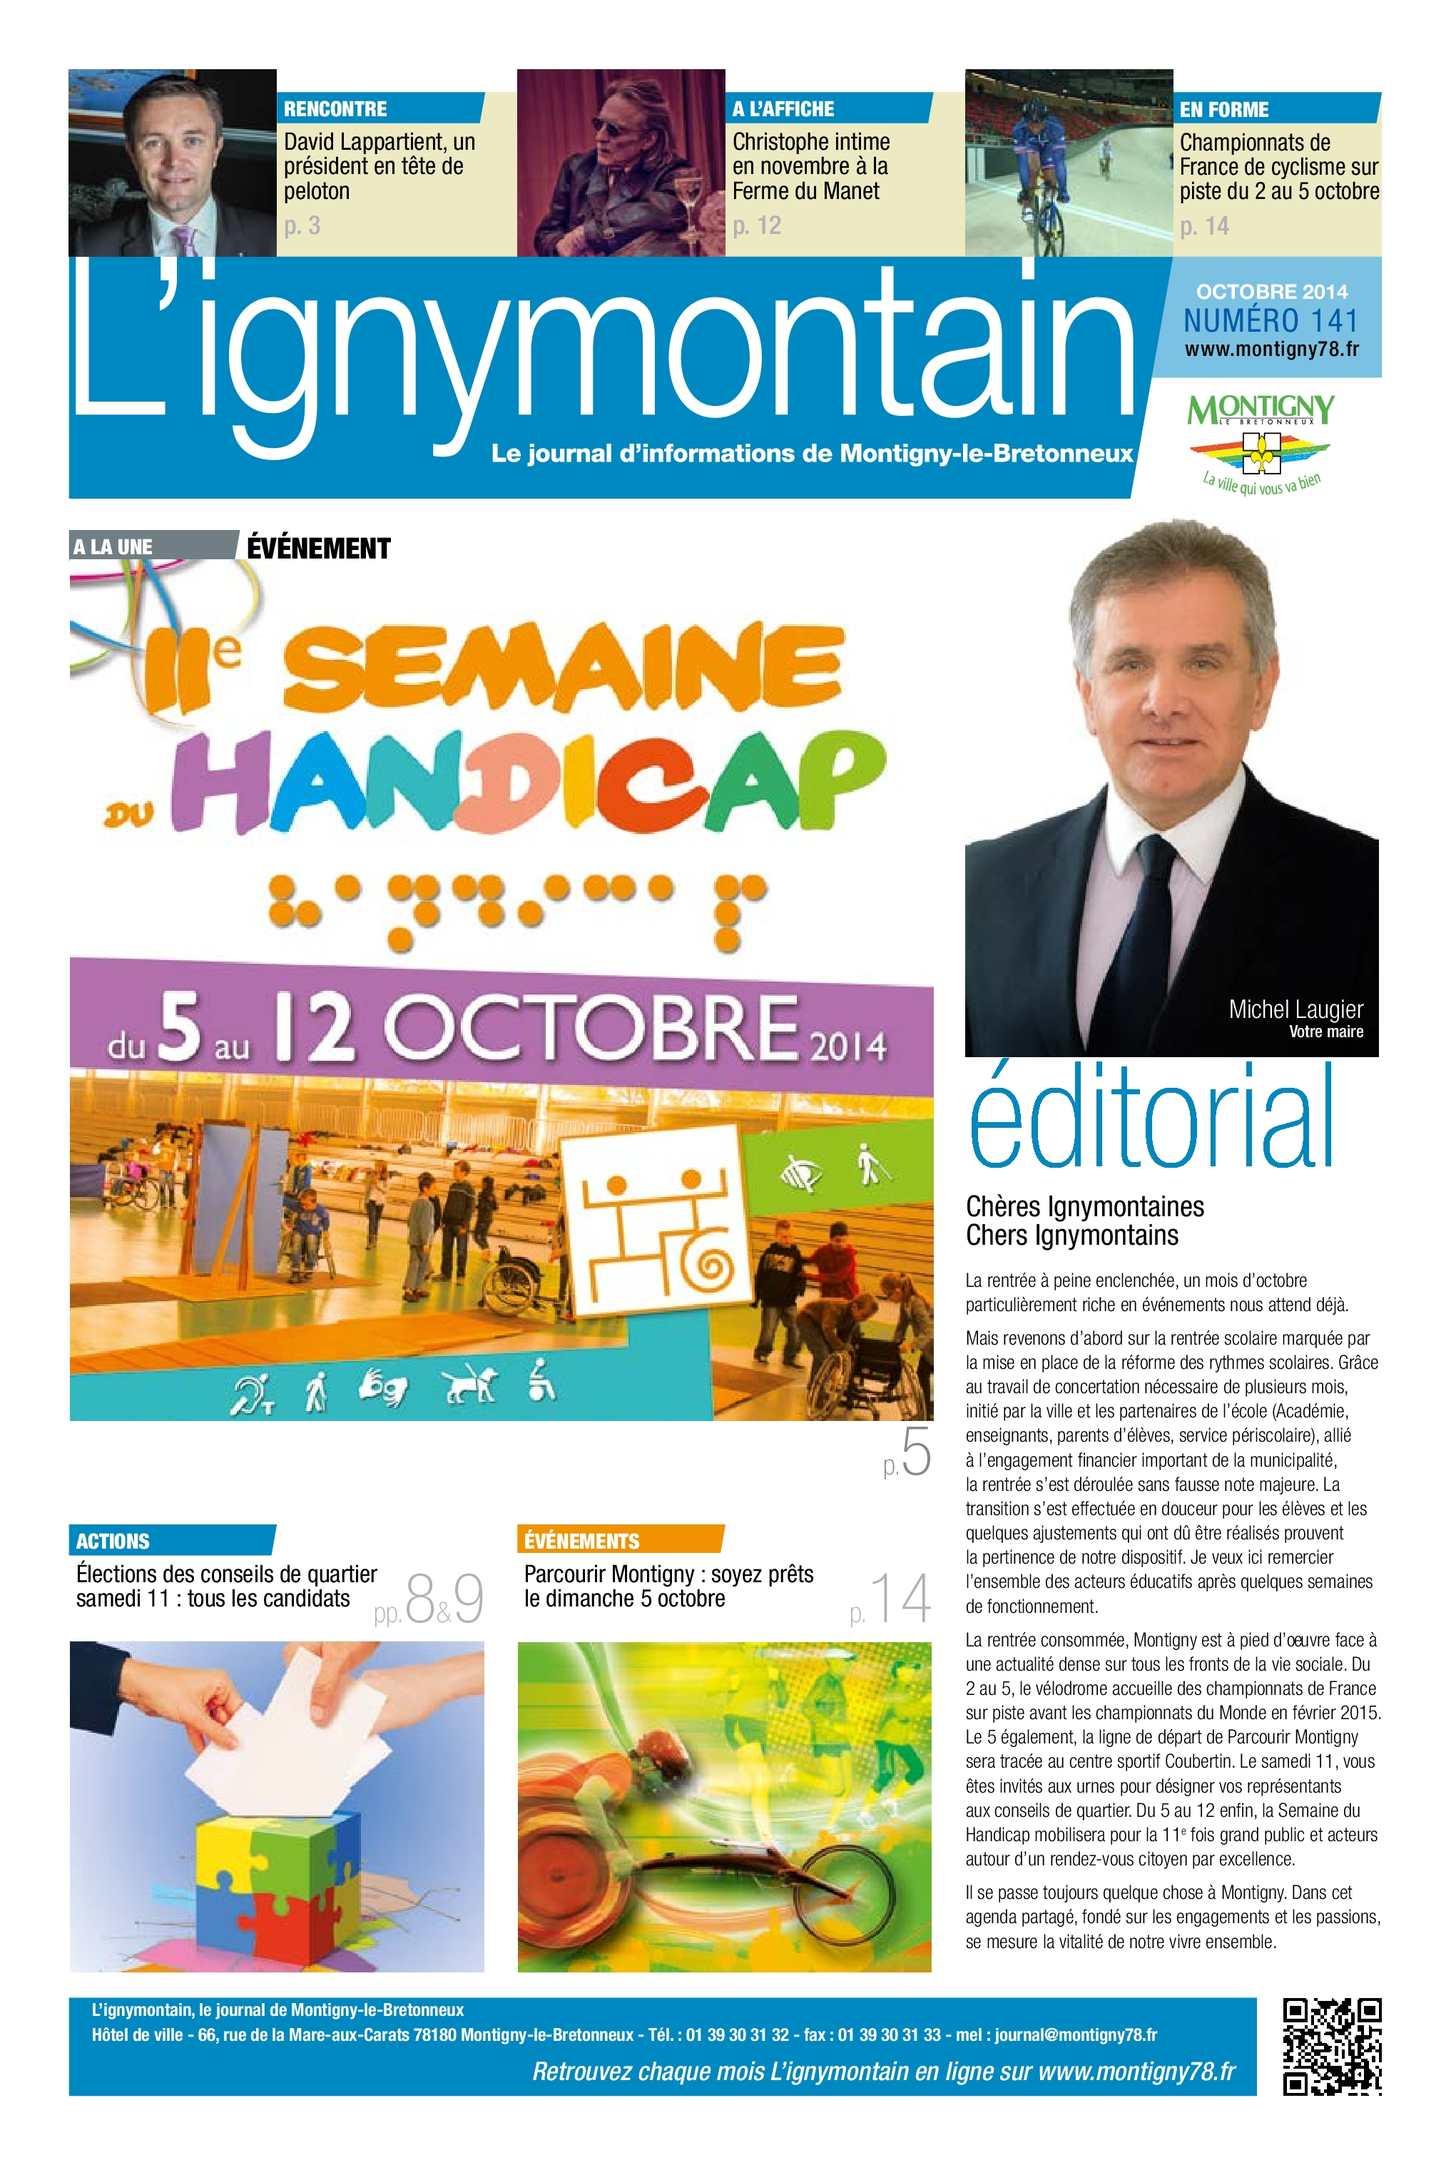 rencontre intime gay resorts a Montigny-le-Bretonneux